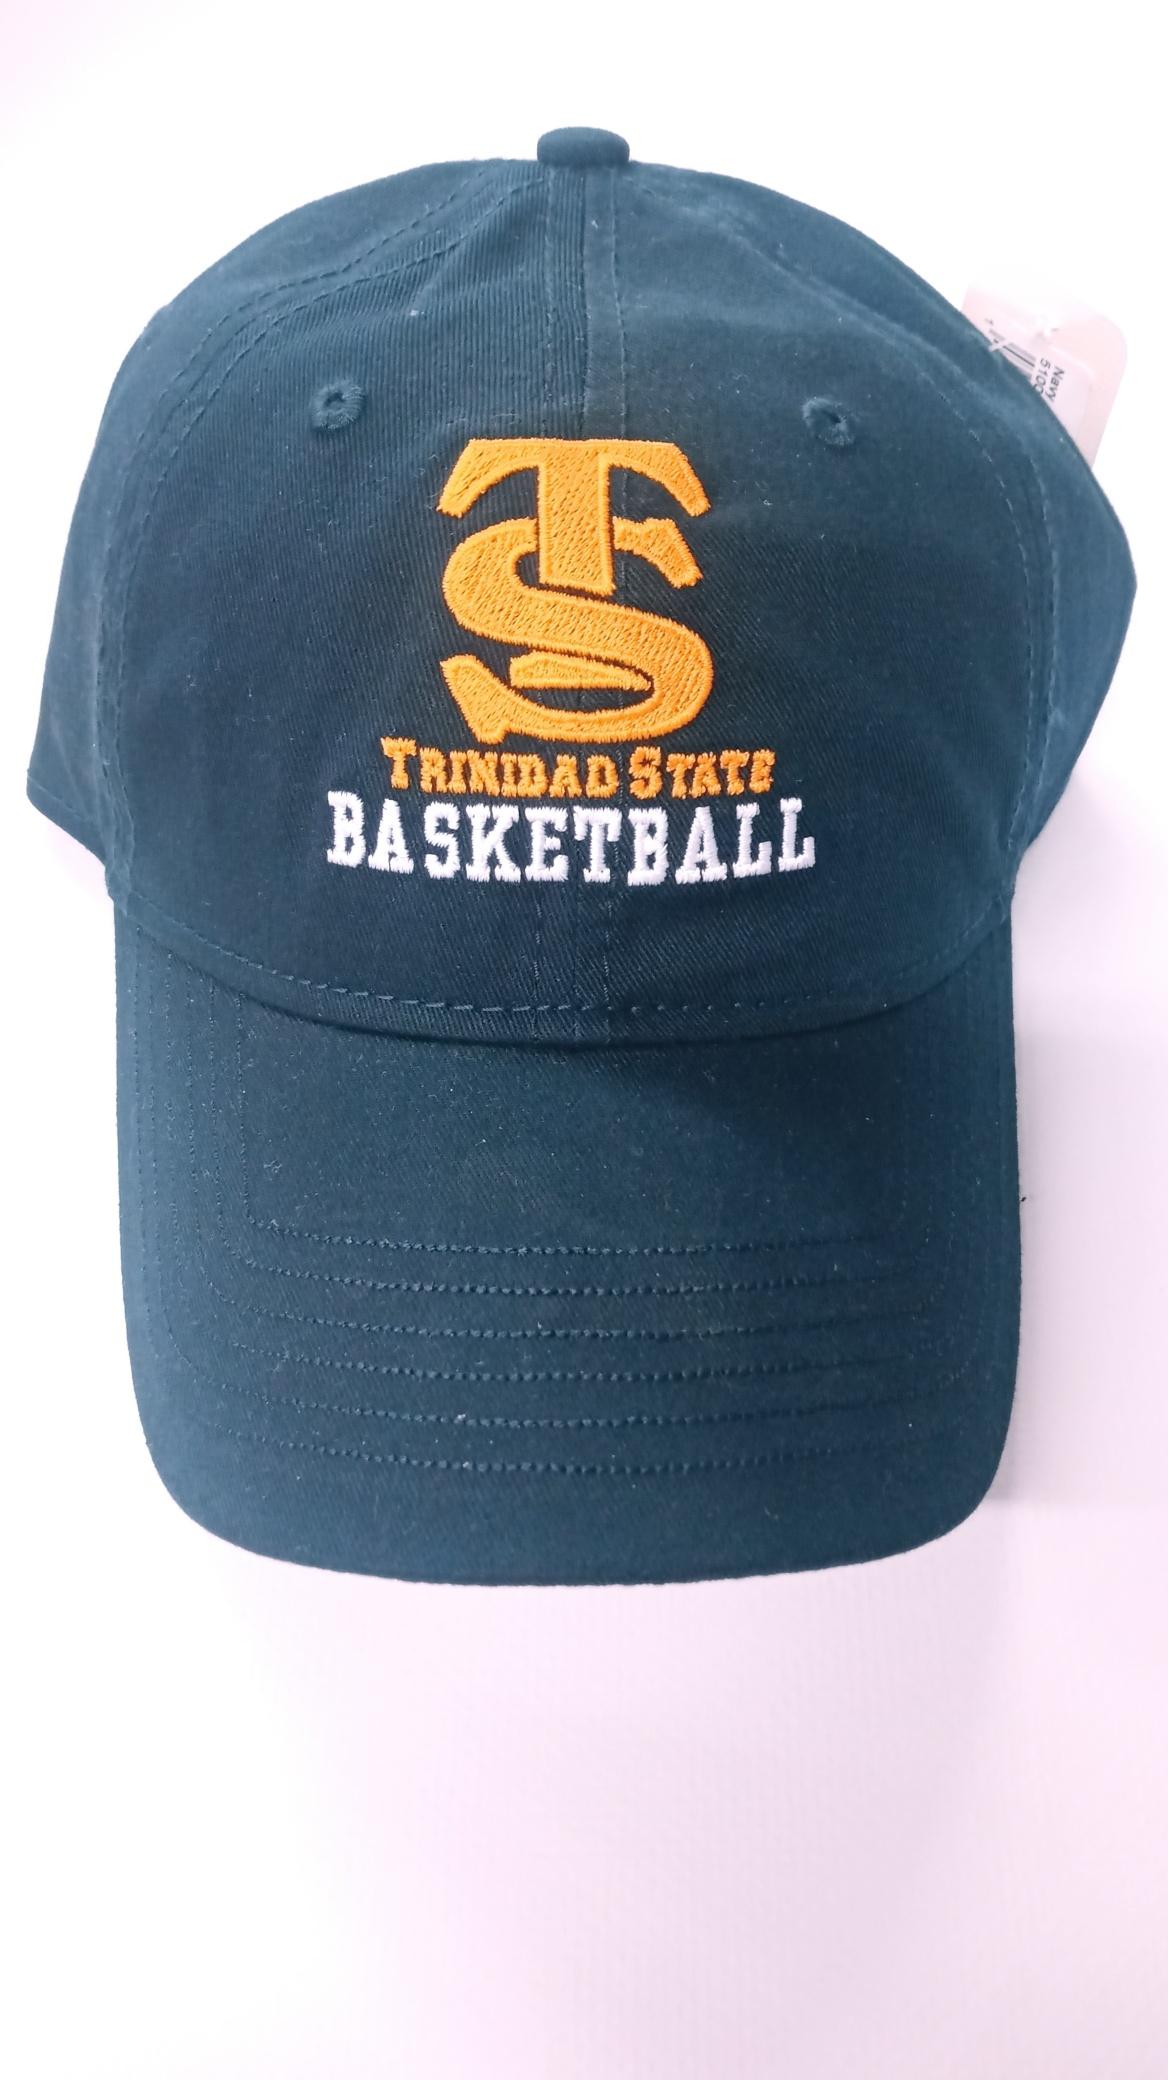 TSJC Baseball Cap (Basketball)